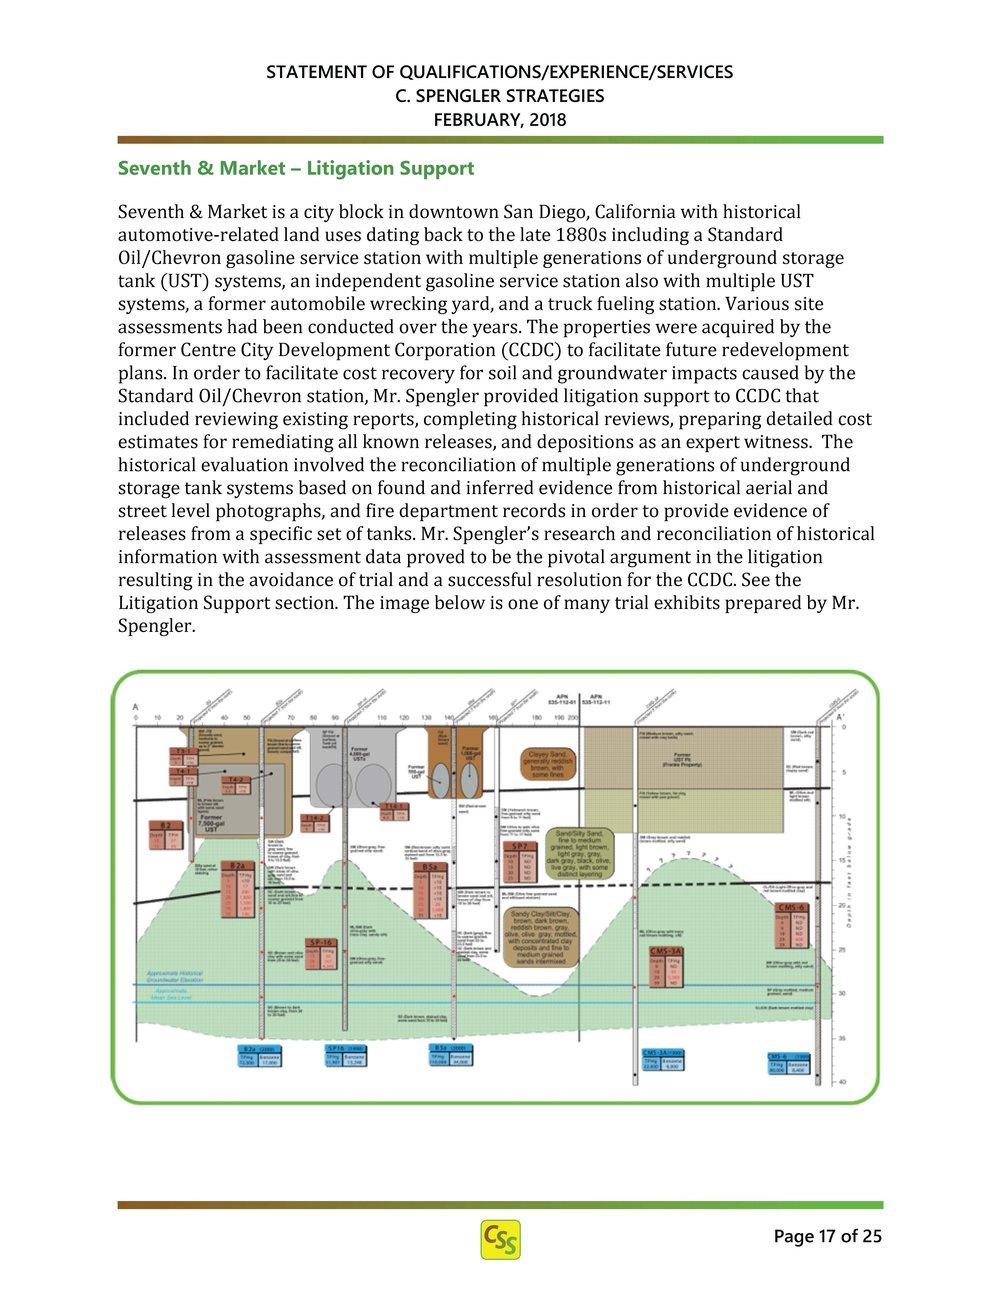 C.Spengler Strategies SOQ.2.13.18_Page_18.jpg